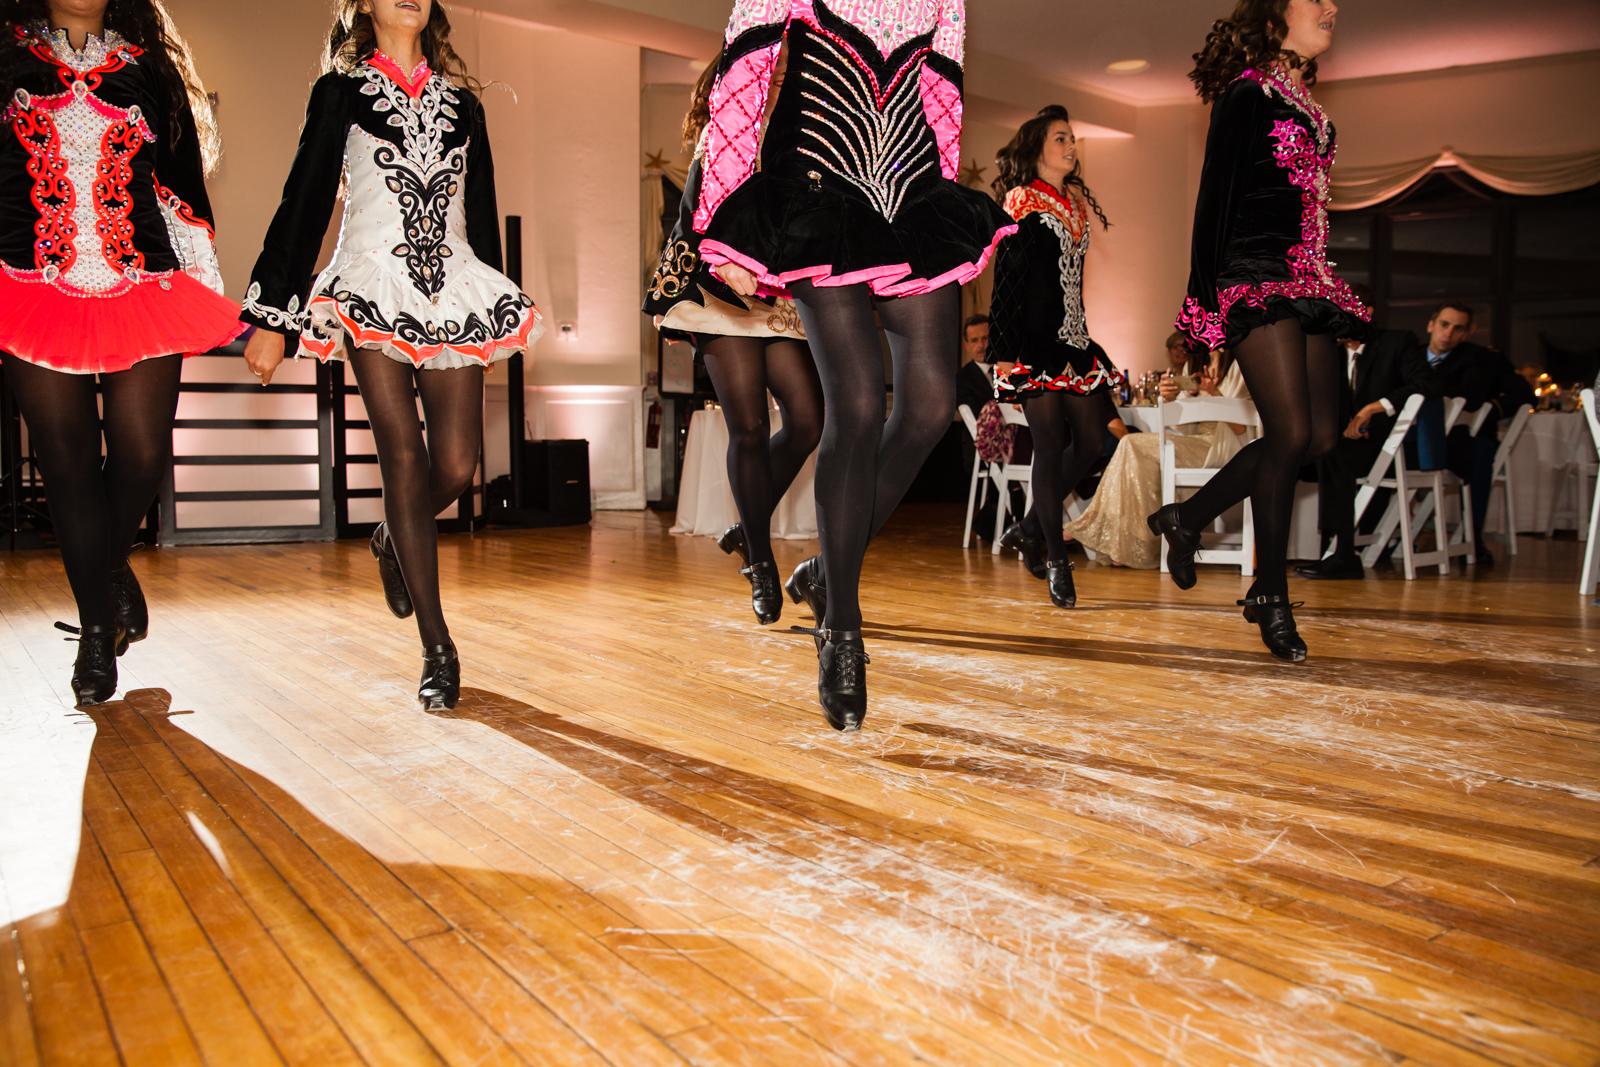 Eastons-Beach-Rotunda-Ballroom-Wedding-Newport-Rhode-Island-PhotographybyAmandaMorgan-114.jpg